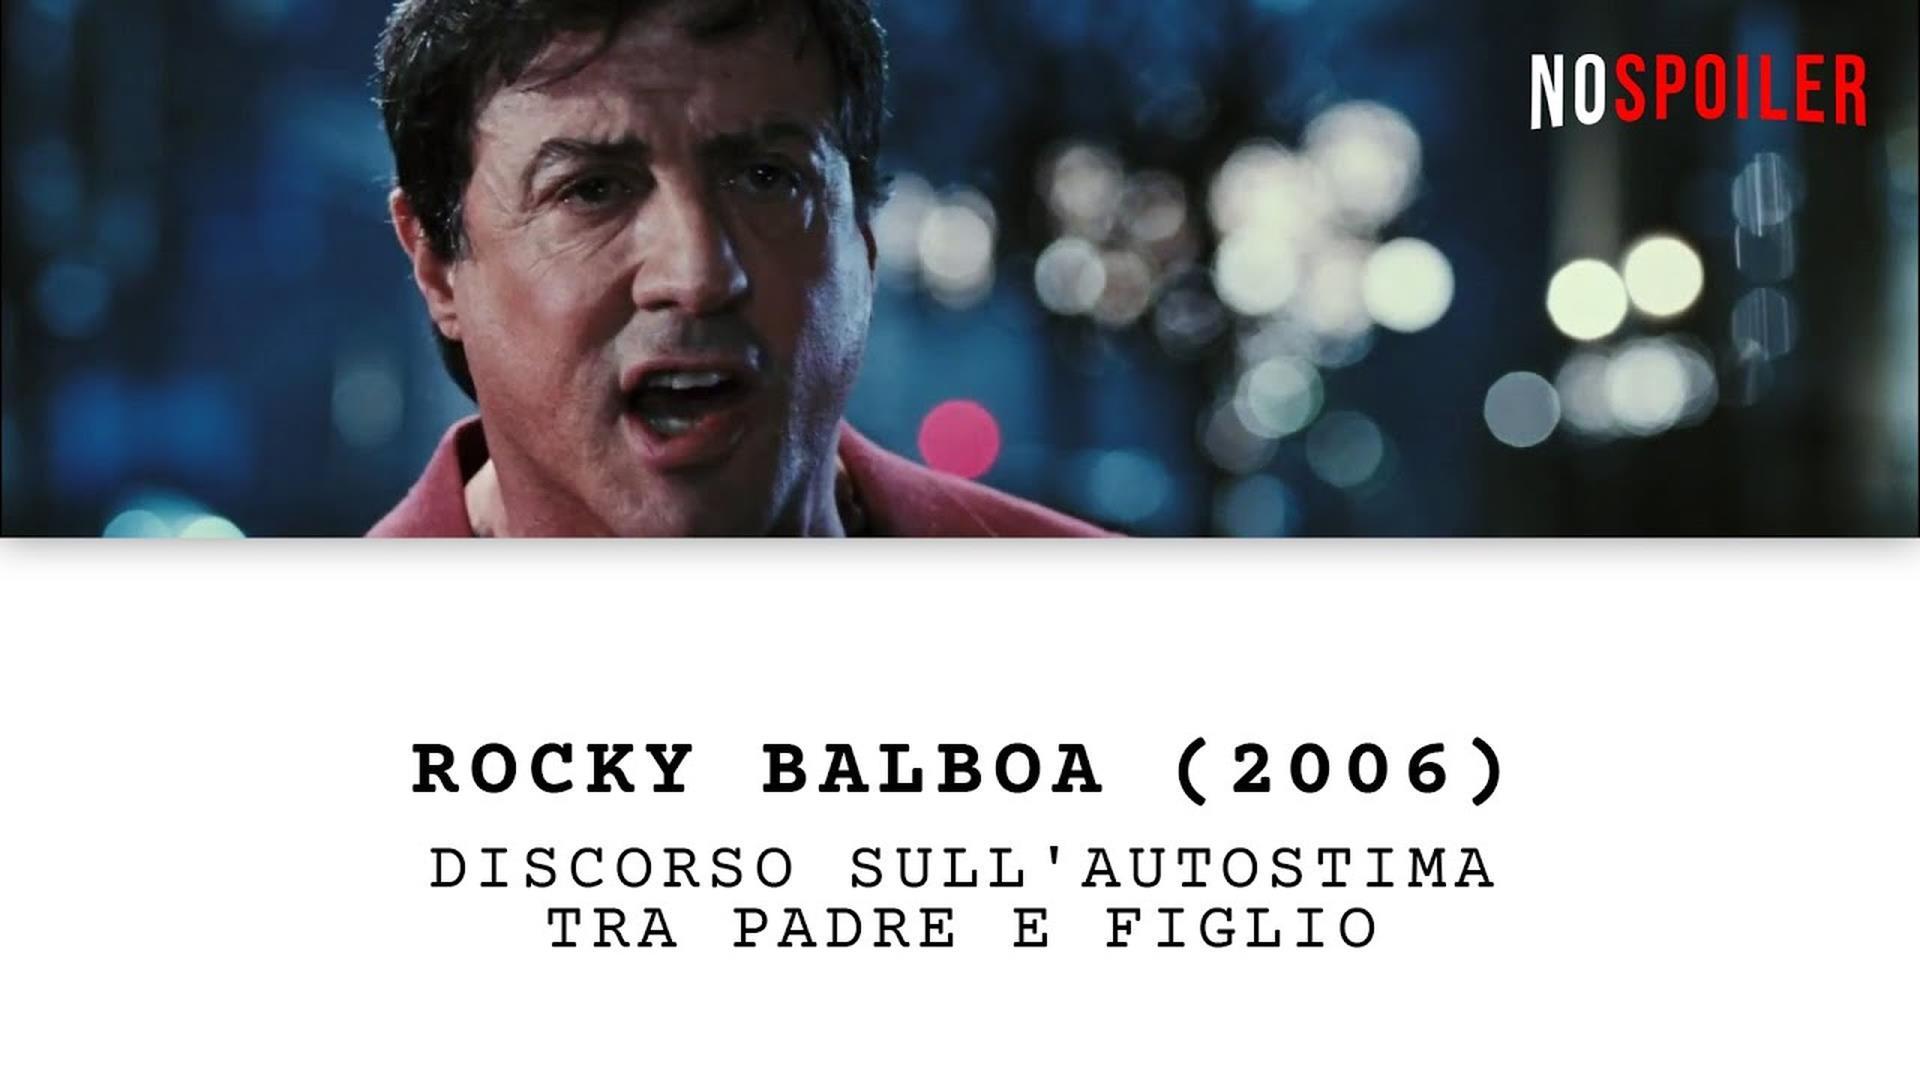 Frasi Celebri Rocky 6.Discorso Sull Autostima Rocky Balboa